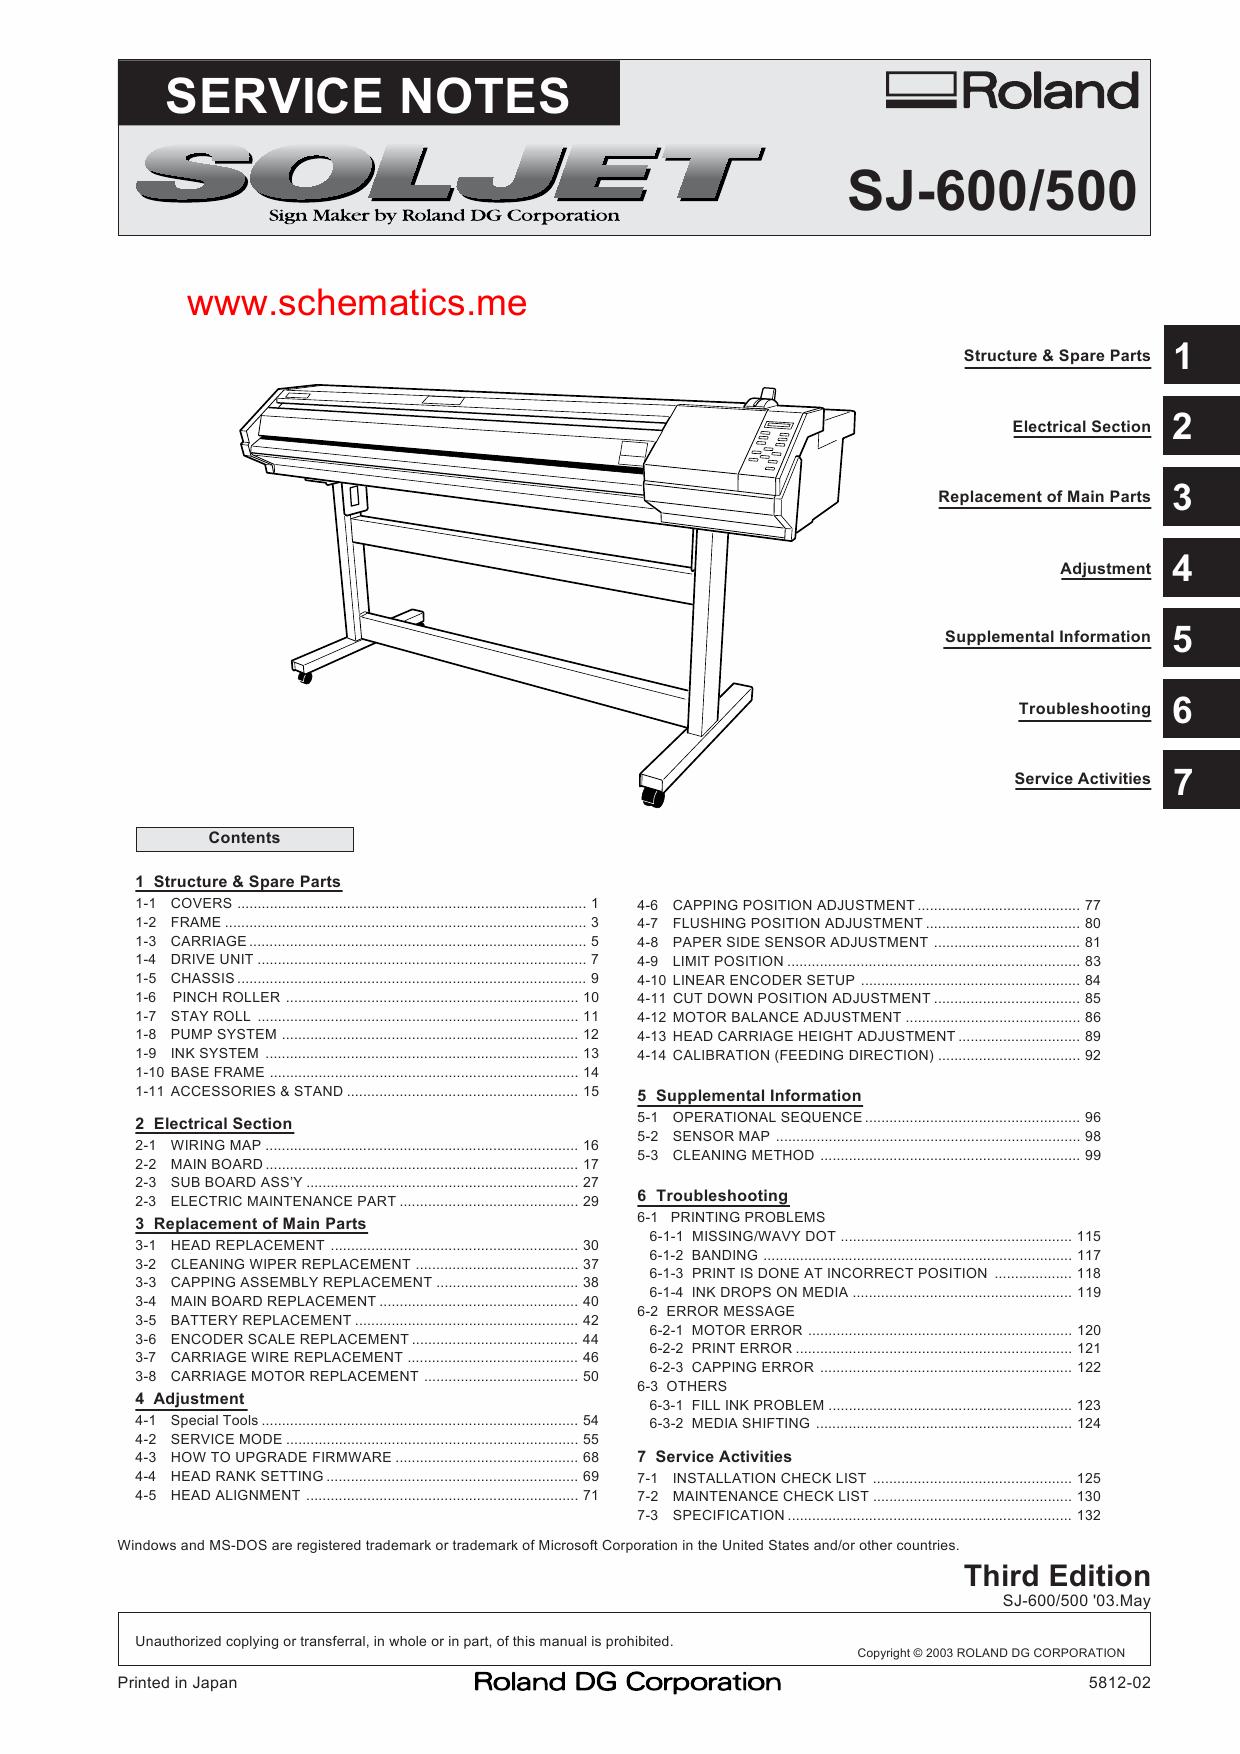 Roland Sj600 Sj 600 500 Sj500 Soljet Service Manual The Legacy Hp Omnibook Xe2